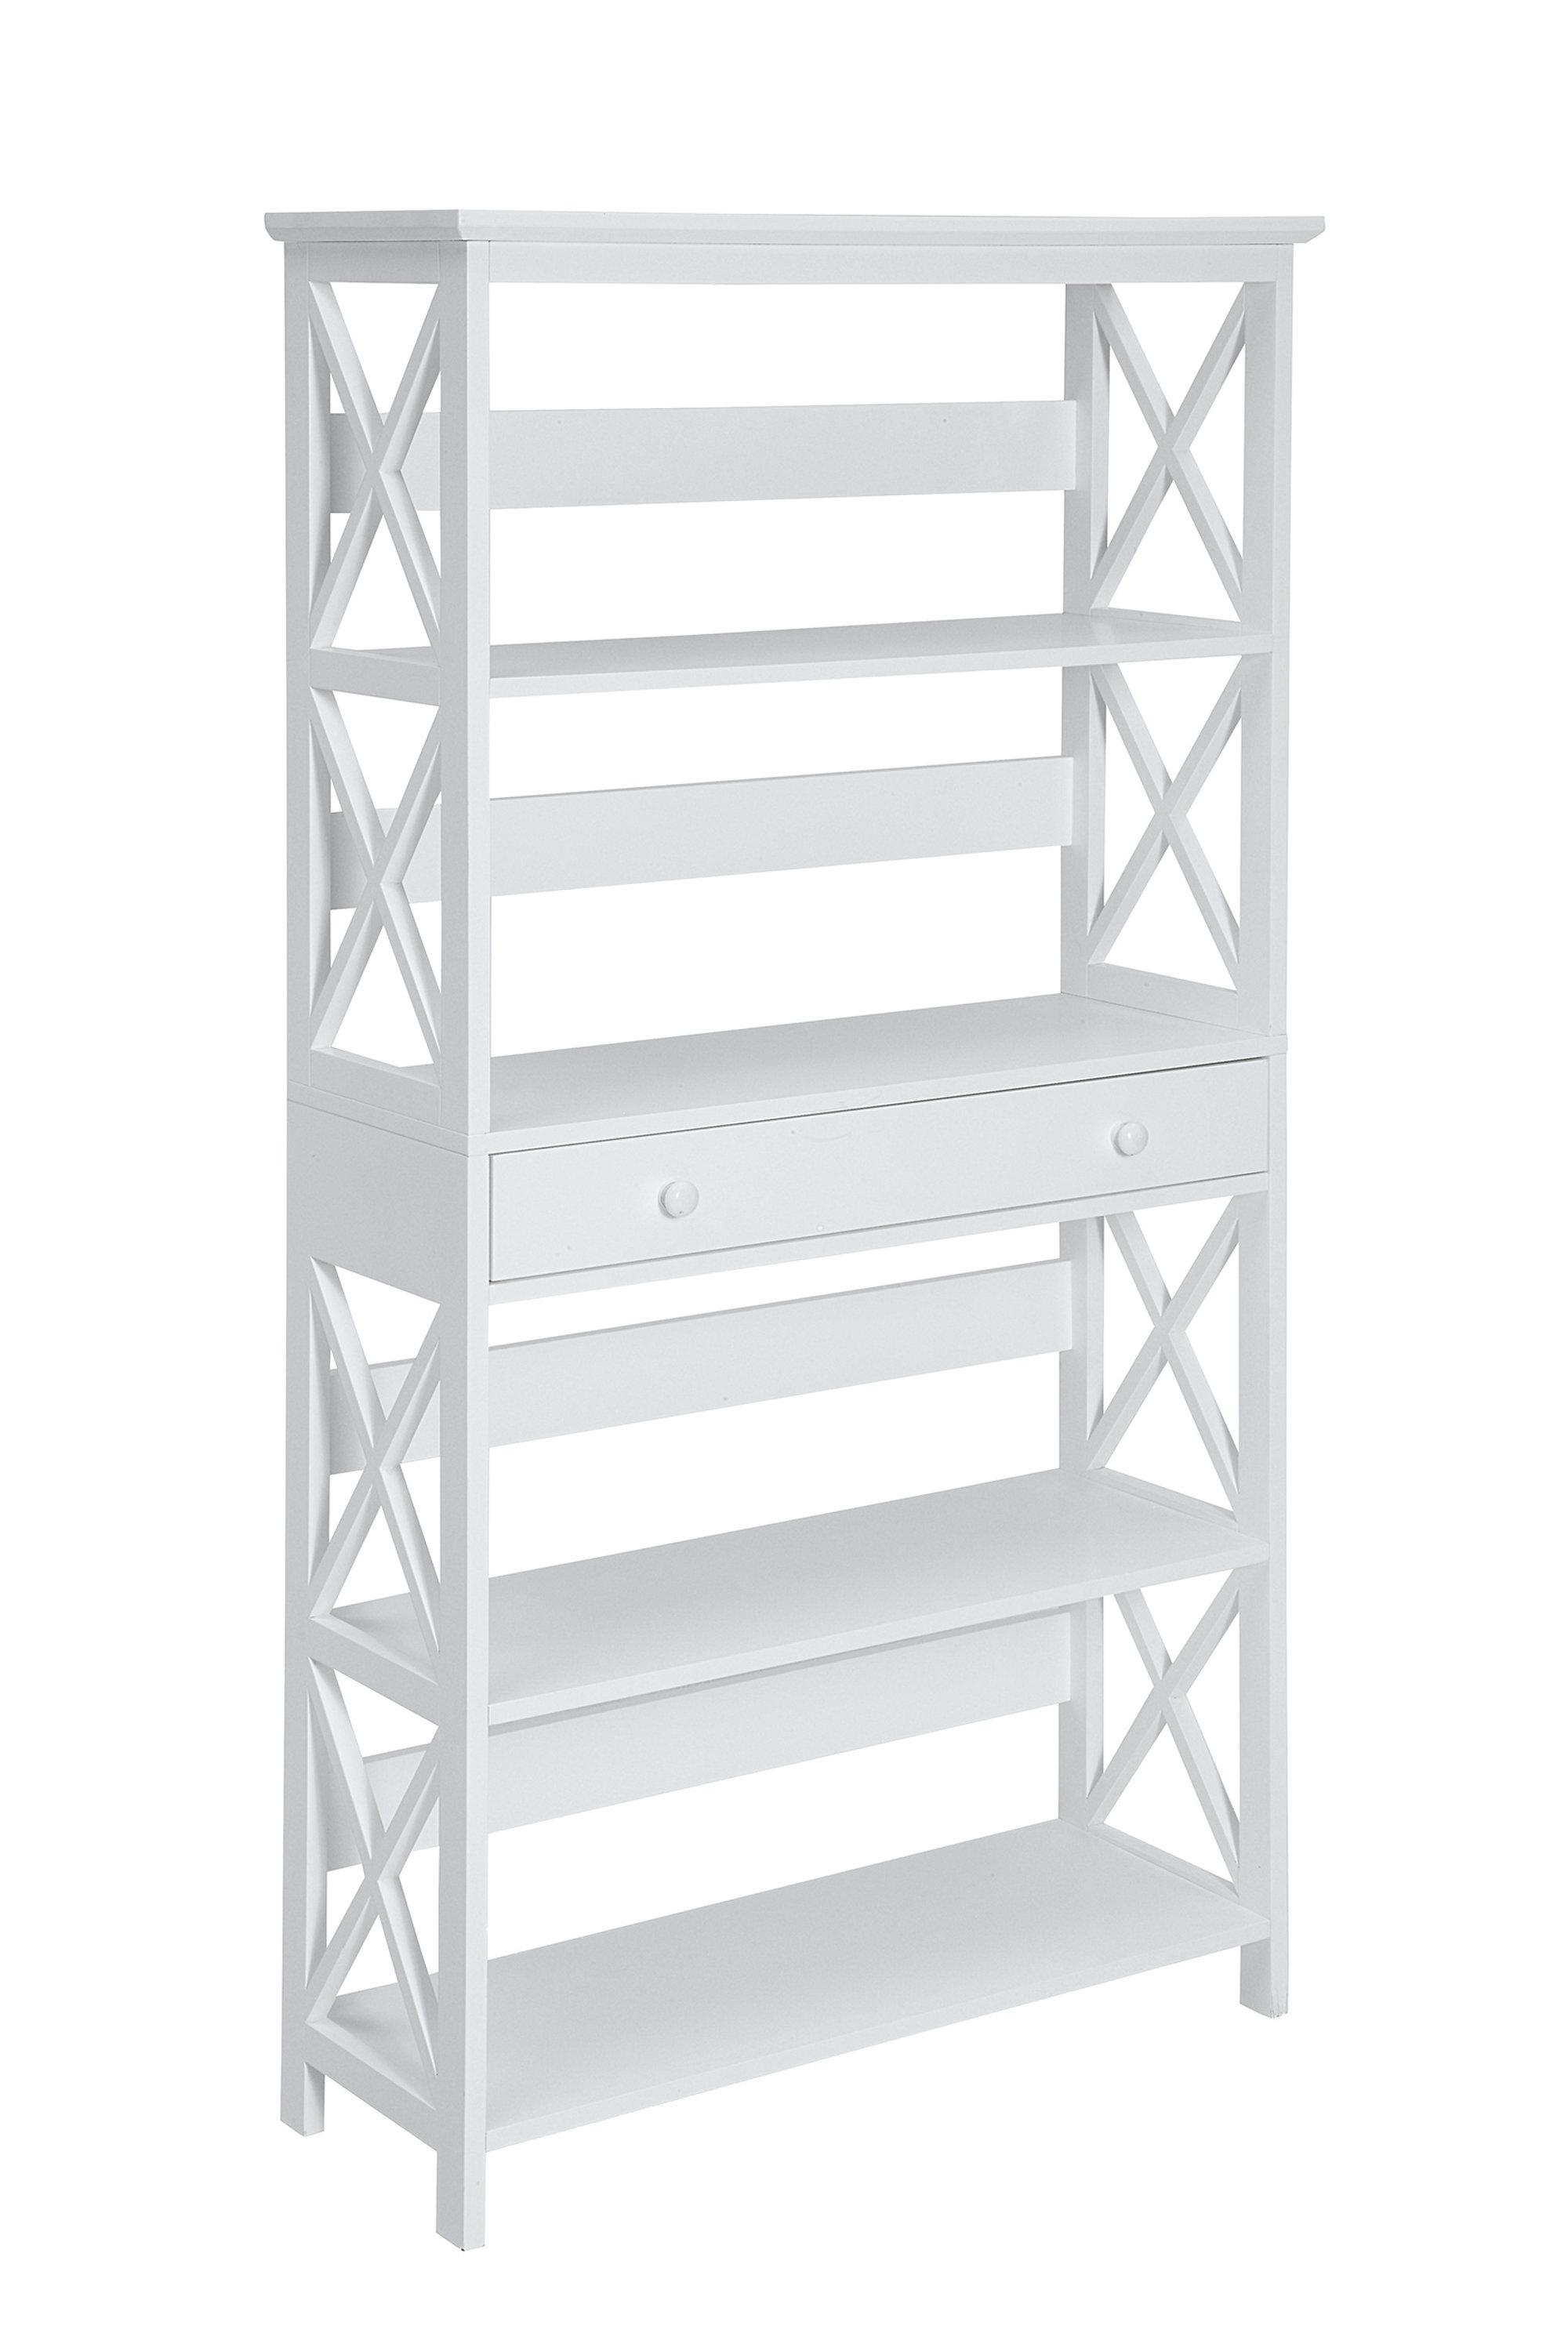 Gracelynn 5 Tier Etagere Bookcase Regarding Most Recently Released Gracelynn 5 Tier Etagere Bookcases (View 4 of 20)